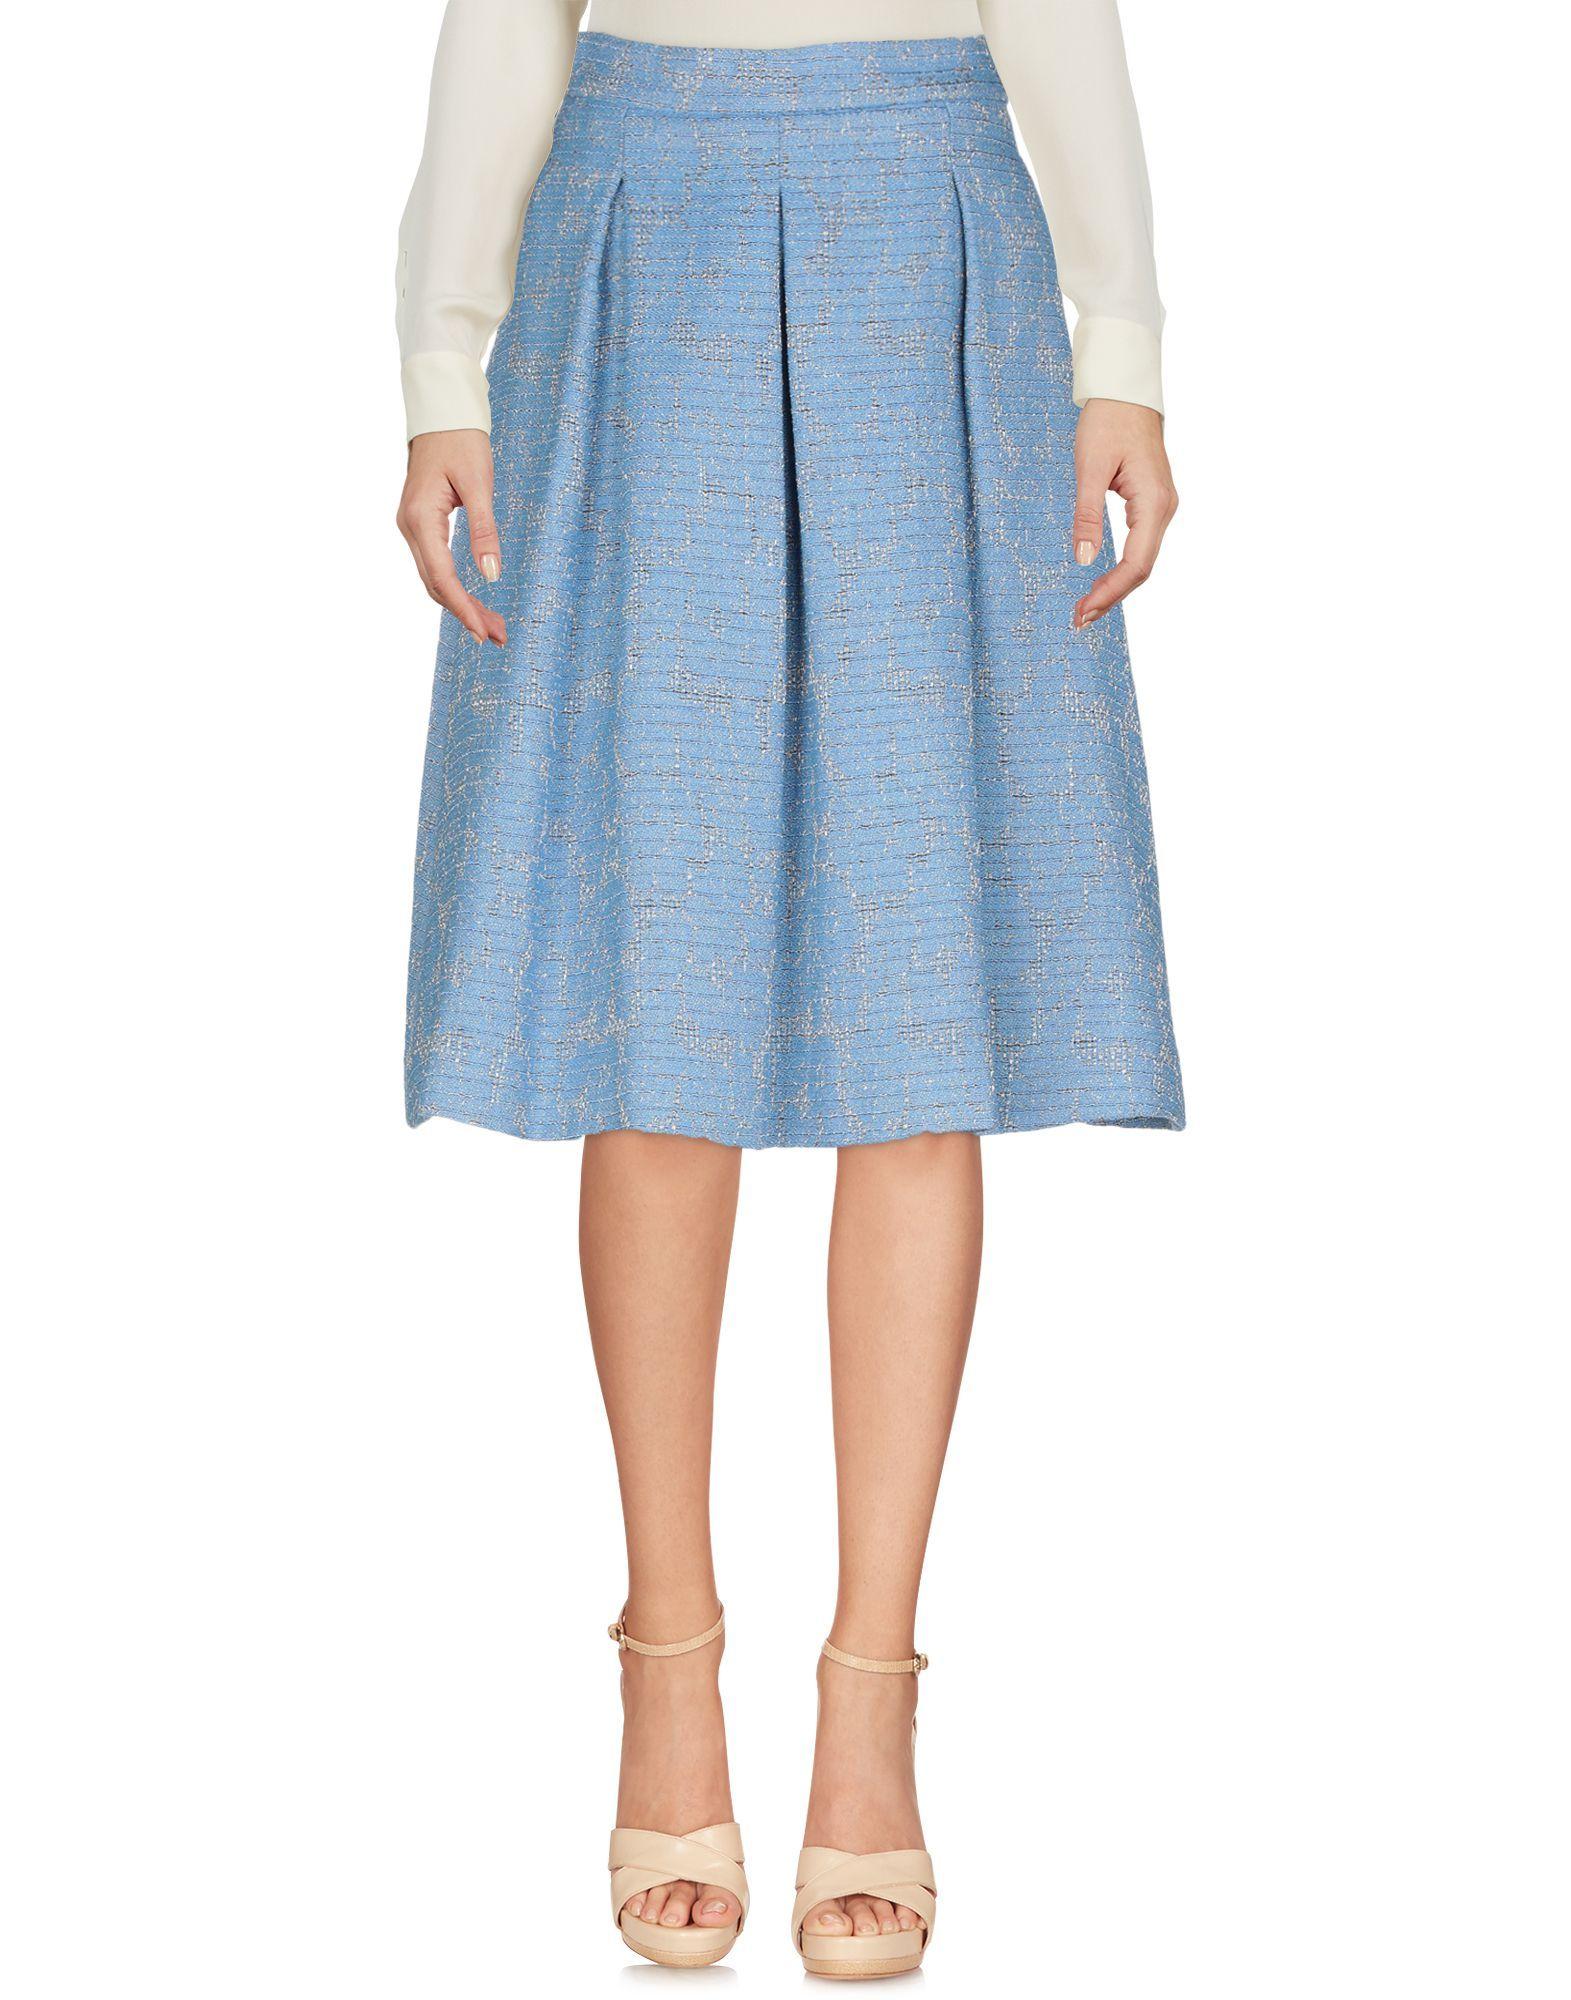 Desconfianza cascada Martin Luther King Junior  Liu •Jo Knee Length Skirt - Women Liu •Jo Knee Length Skirts online on YOOX  United States - 35400220FO   Knee length skirt, Womens skirt, Skirts